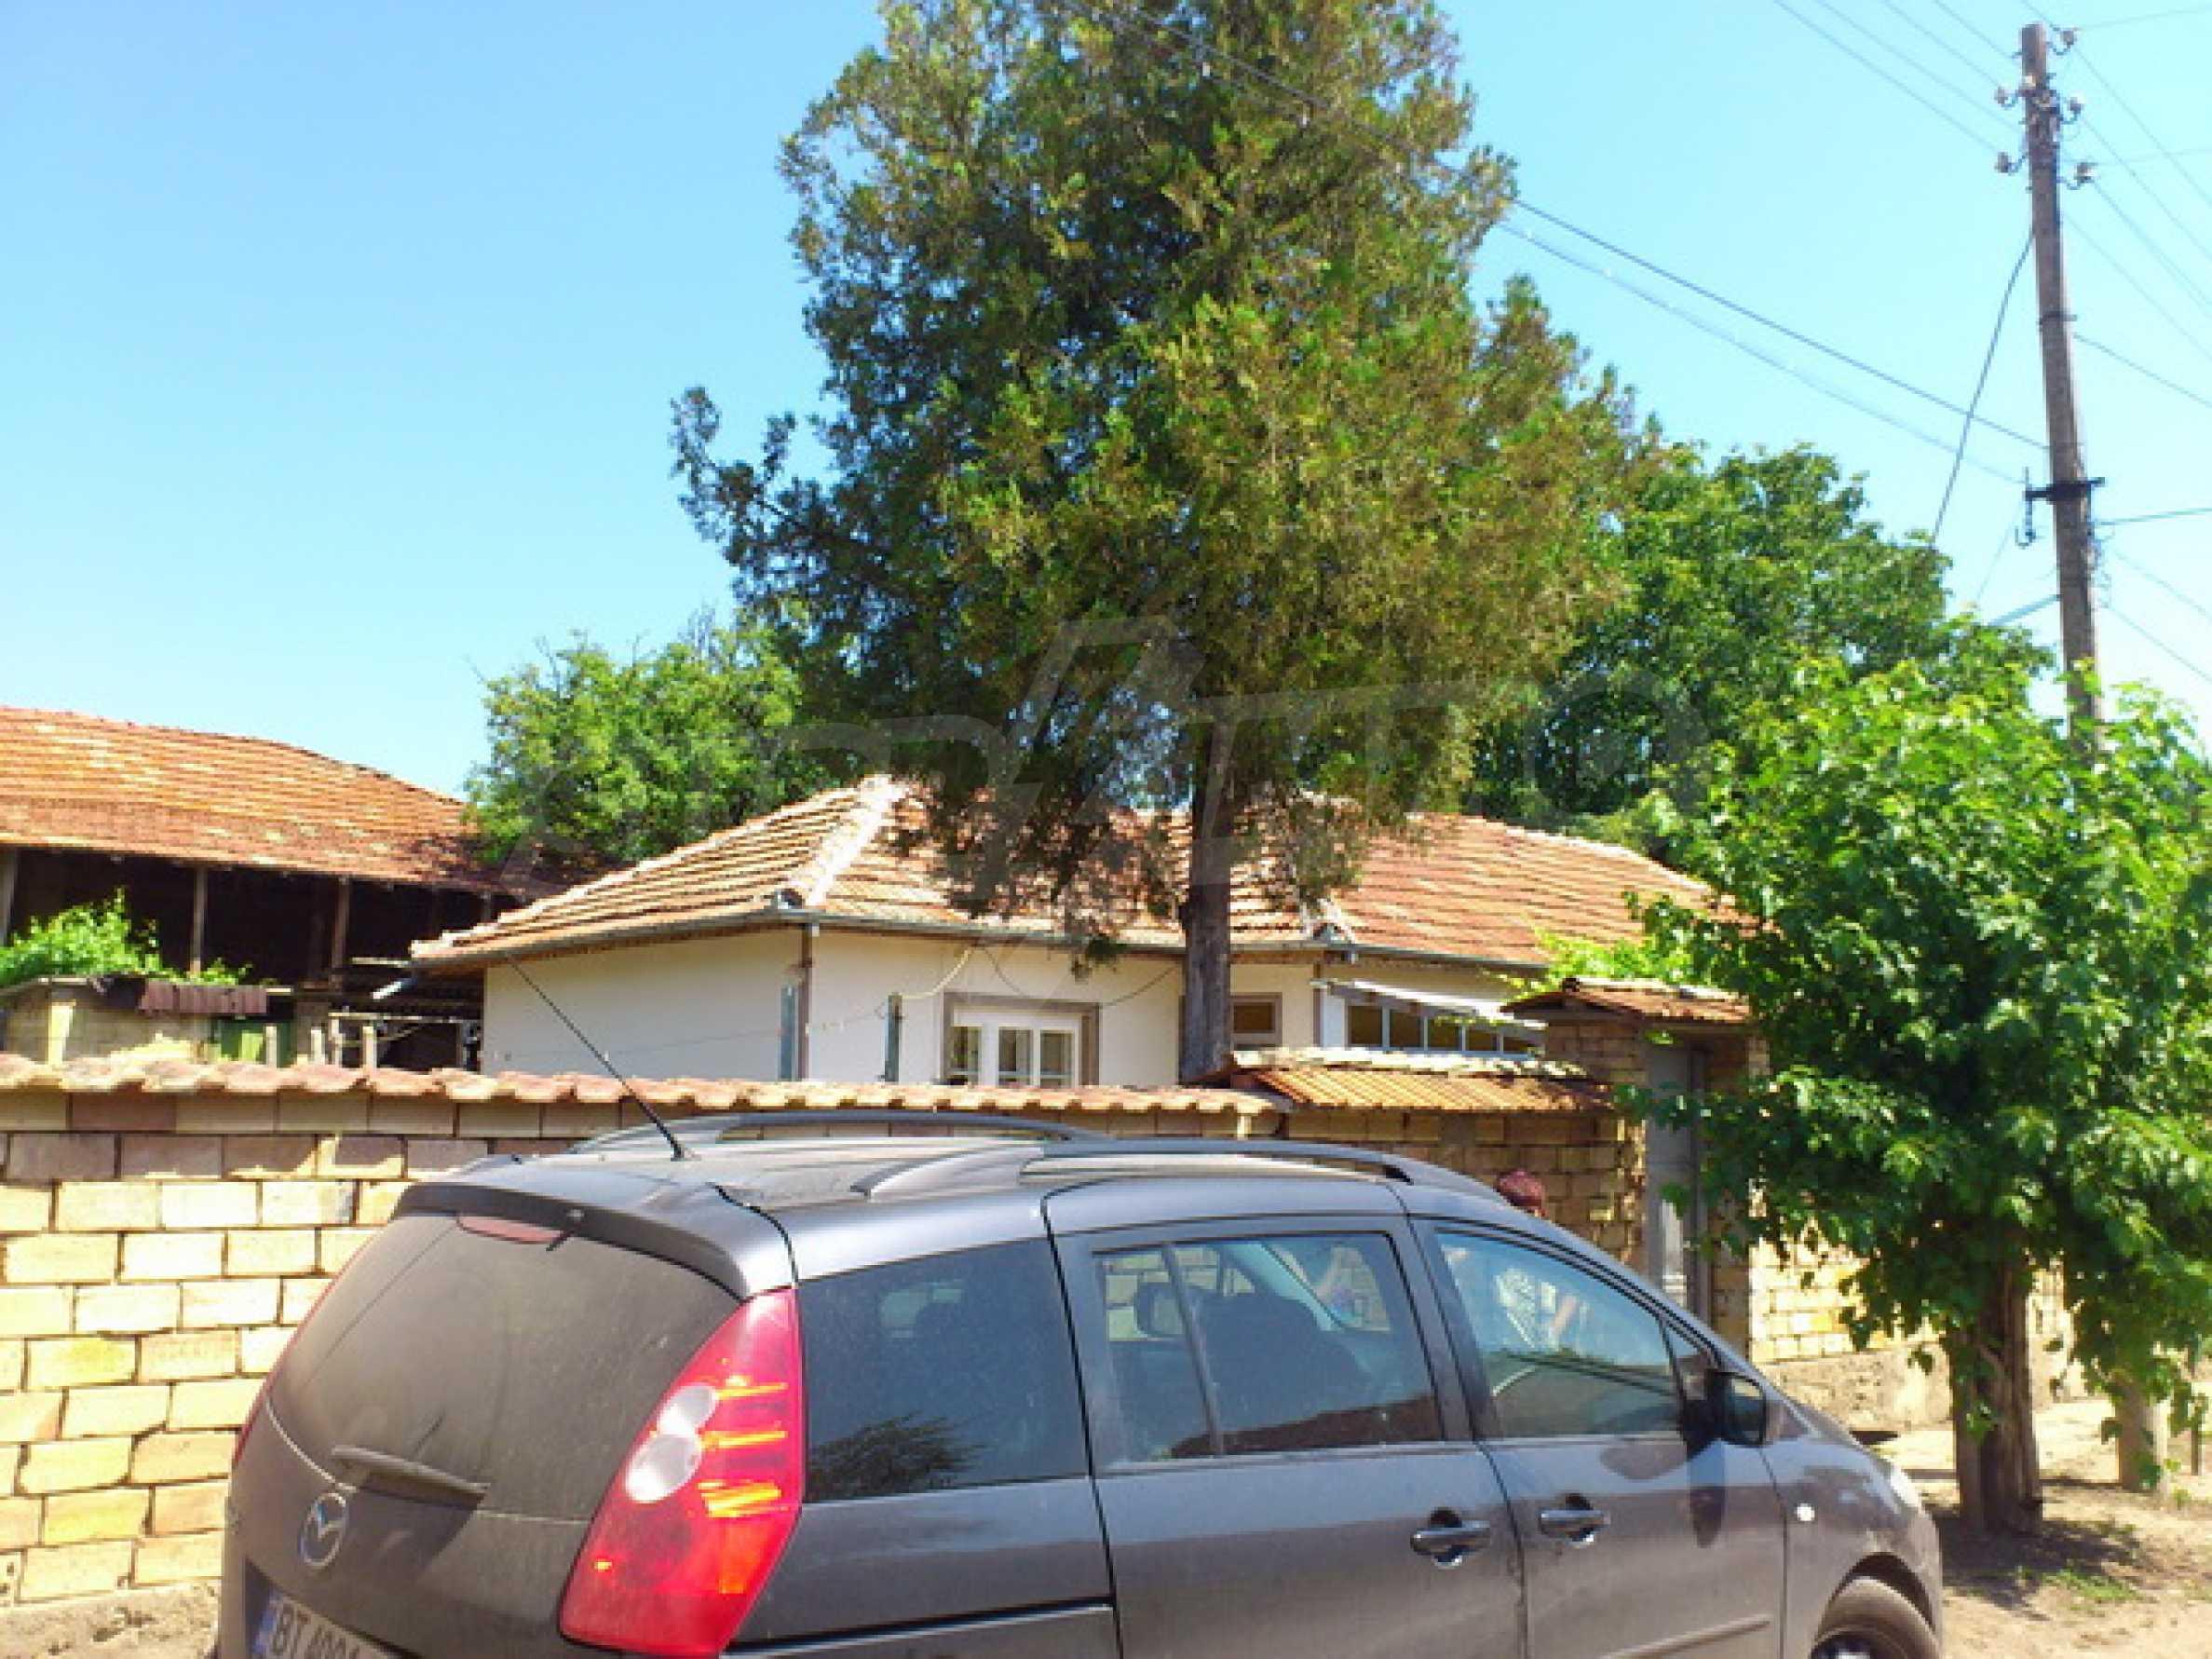 Renovated farmhouse in excellent condition in a village 45 km. from Veliko Tarnovo 38